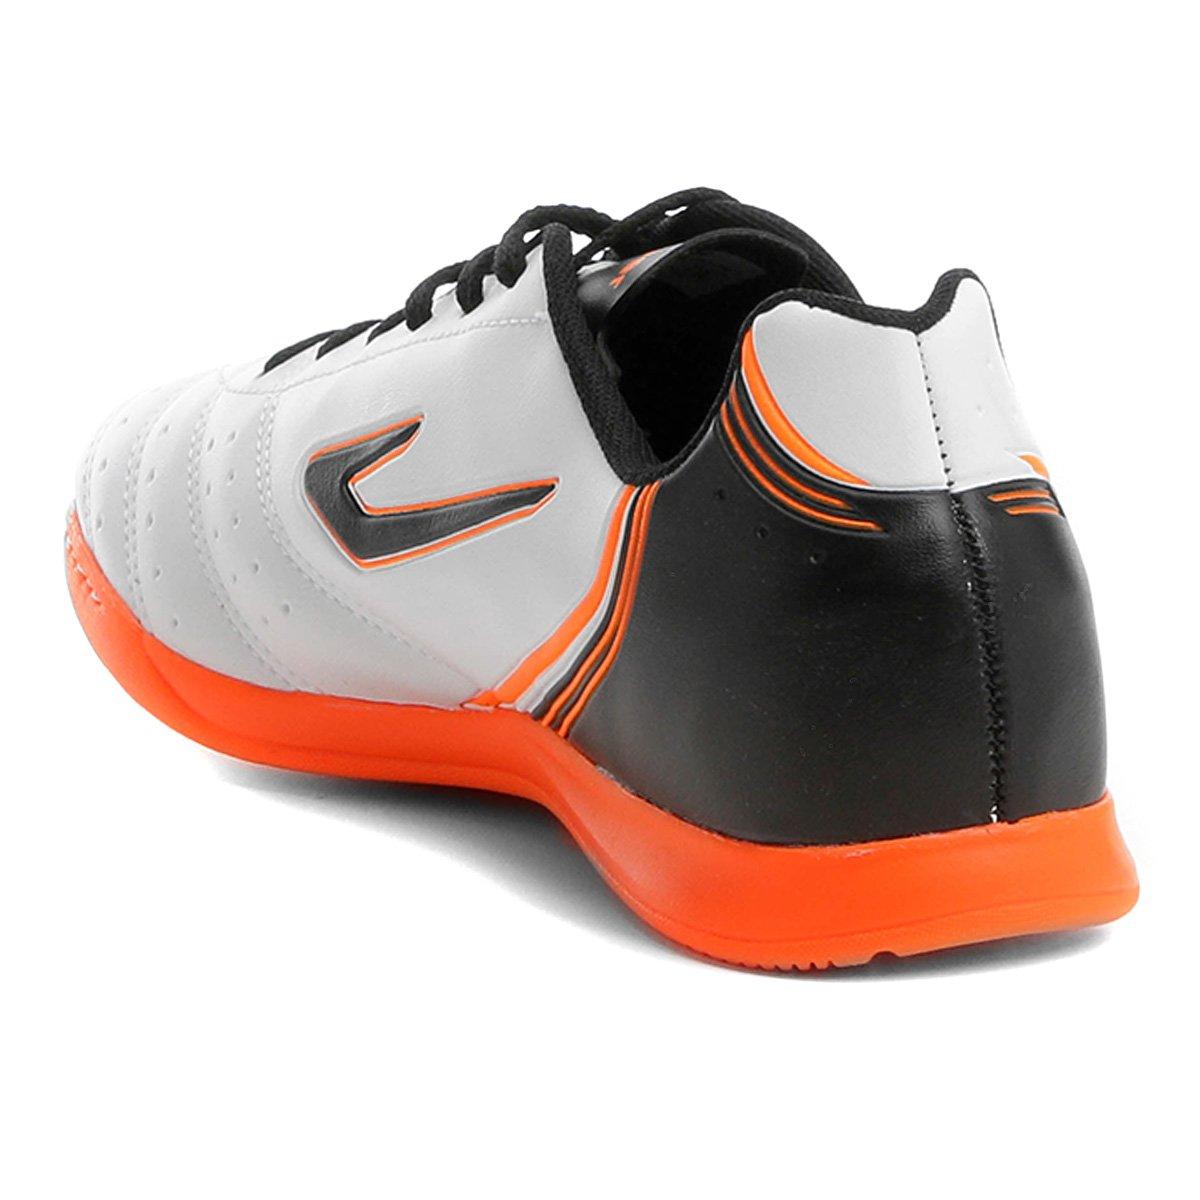 fafc557def Chuteira Futsal Topper Drible - Branco - Compre Agora